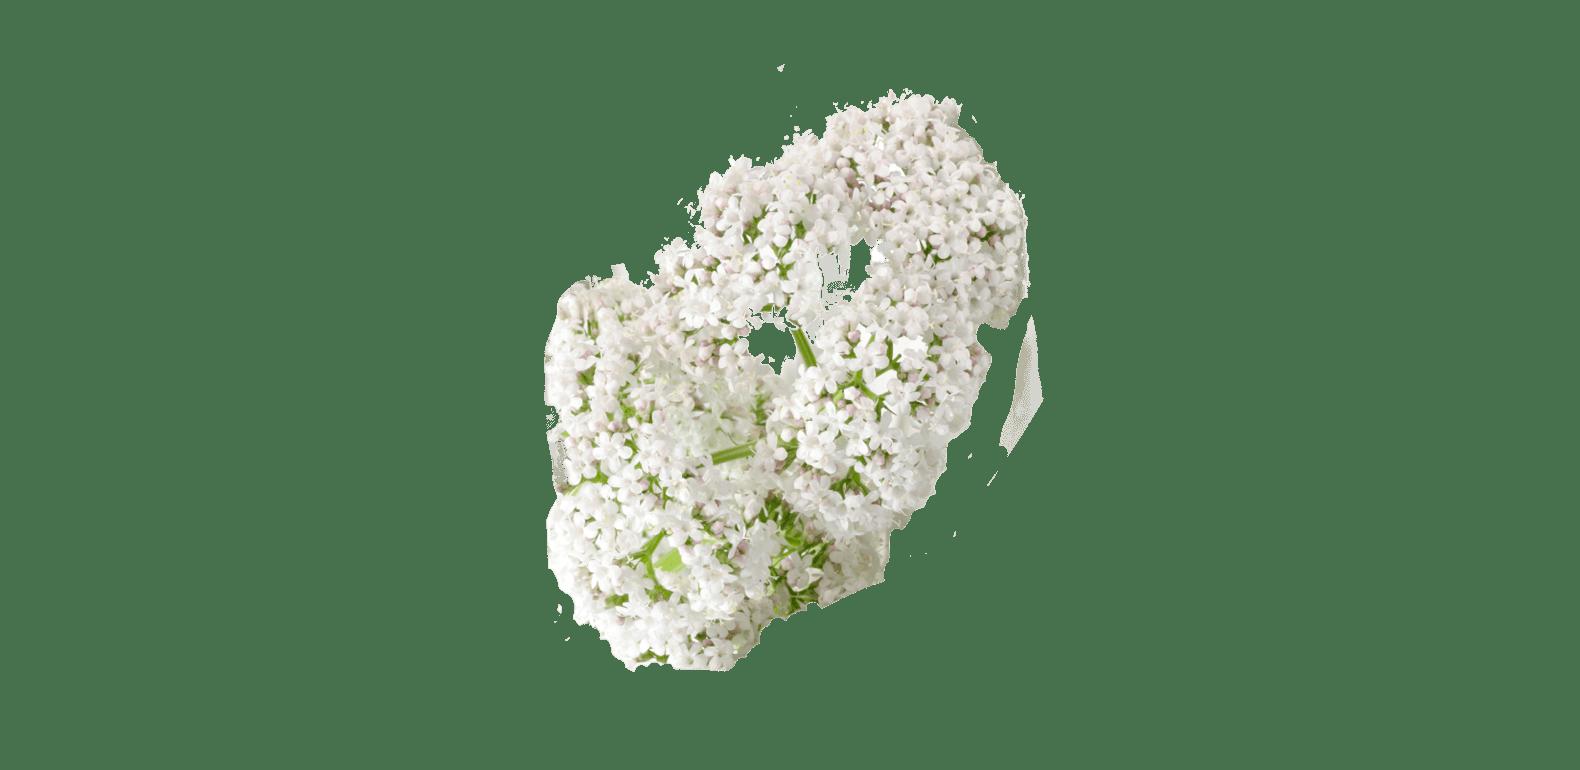 Valériane - Valeriana officinalis